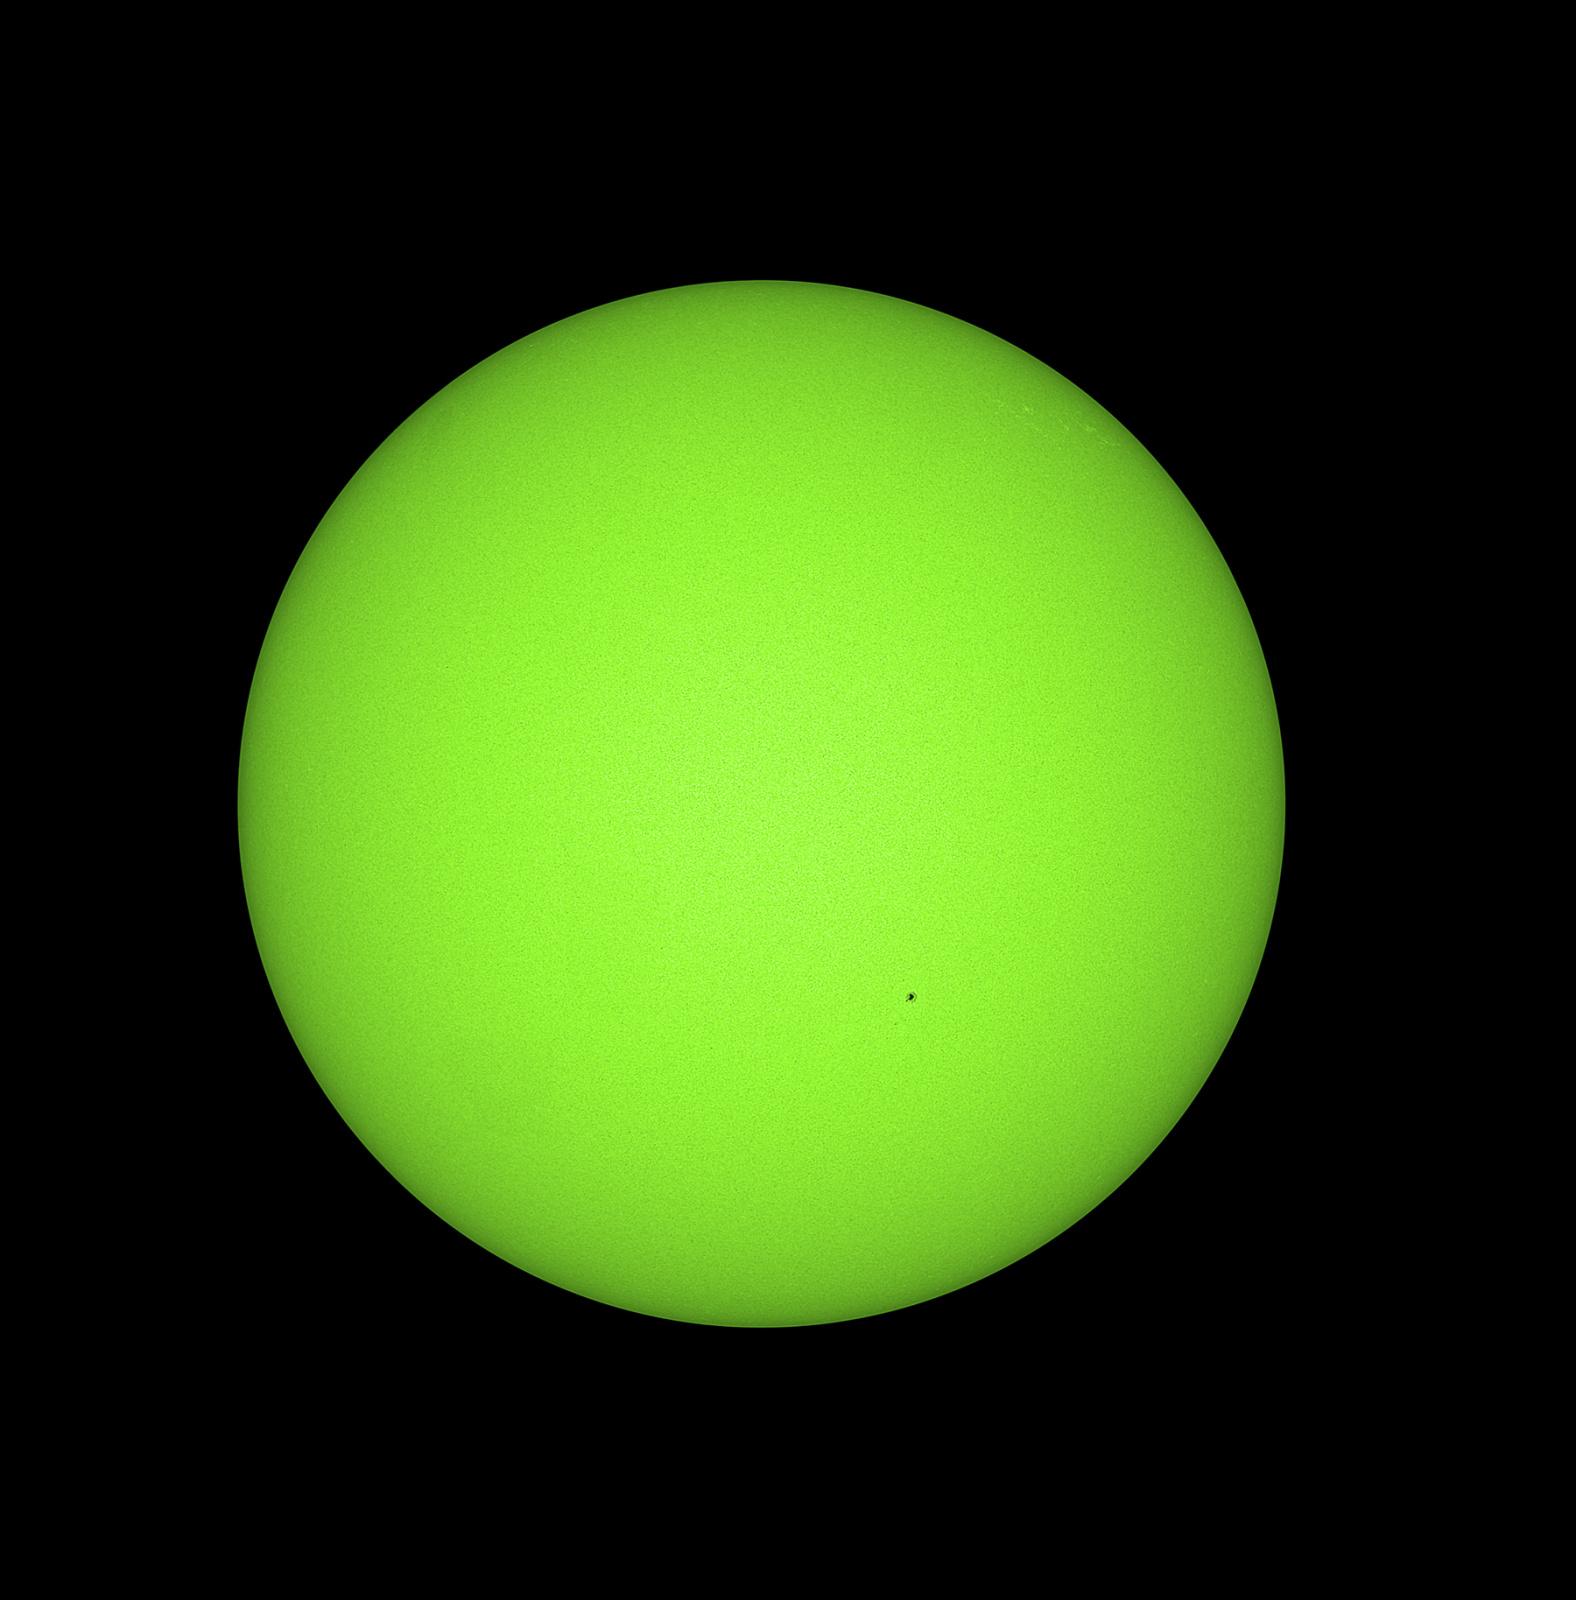 20200610_Sun_ver_540nm.thumb.jpg.94548c8c2efcf1bfc60bd8be77cf6f89.jpg